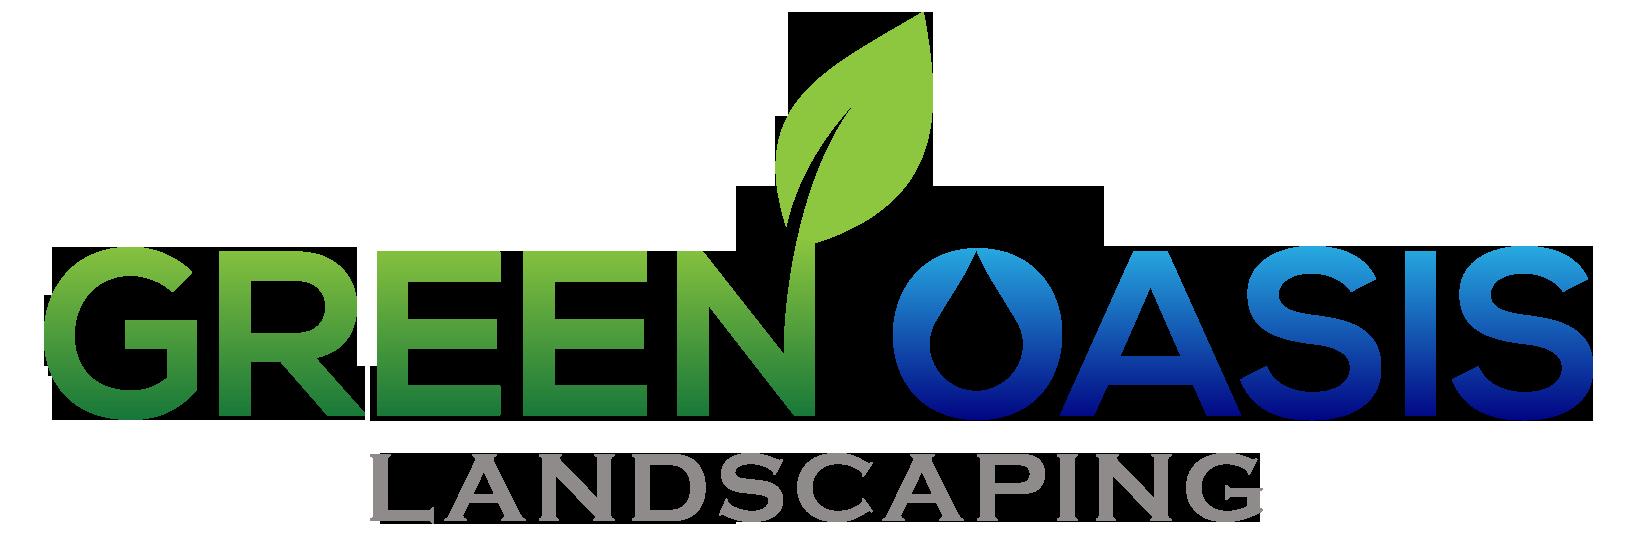 Green-Oasis-Landscaping-Logo